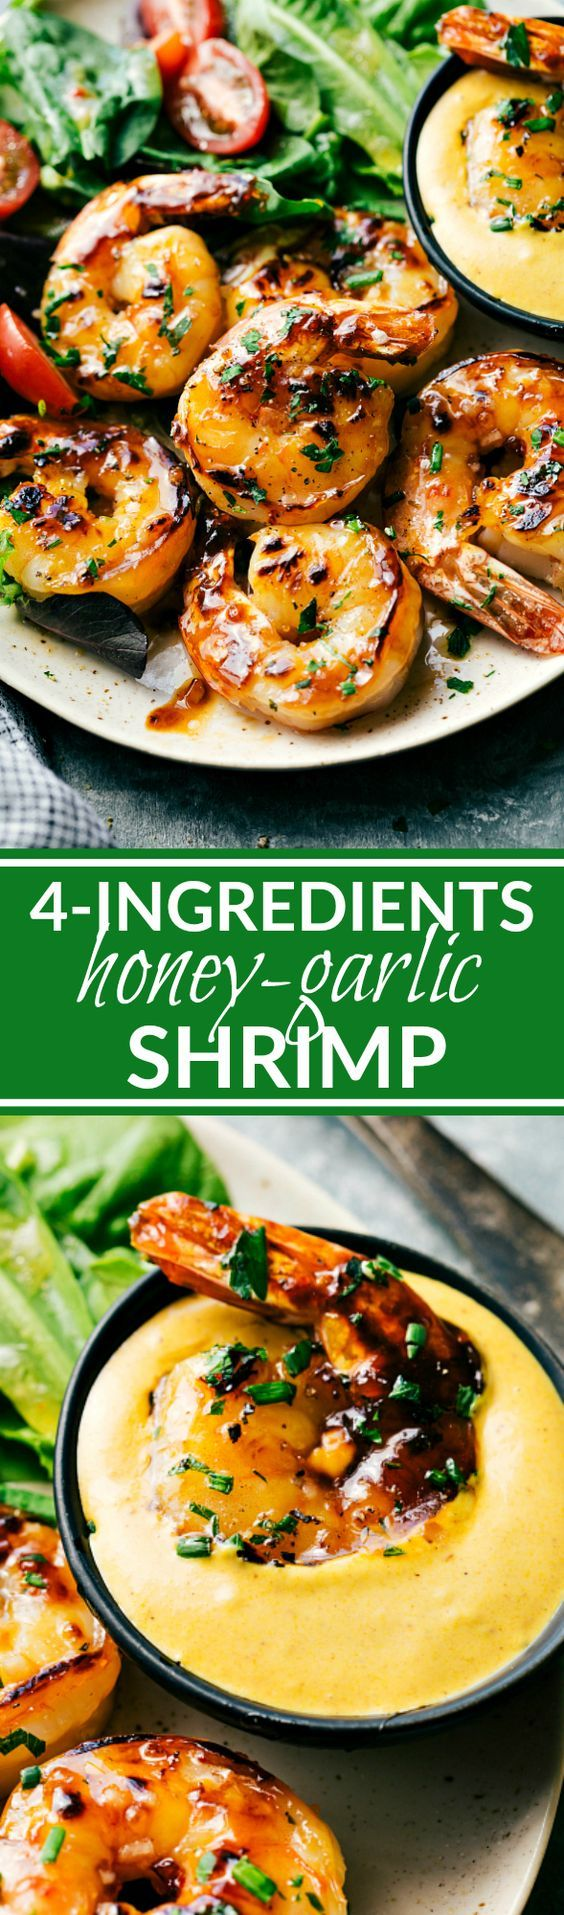 SWEET HONEY GARLIC SHRIMP! The easiest shrimp dish! Only threeingredients…